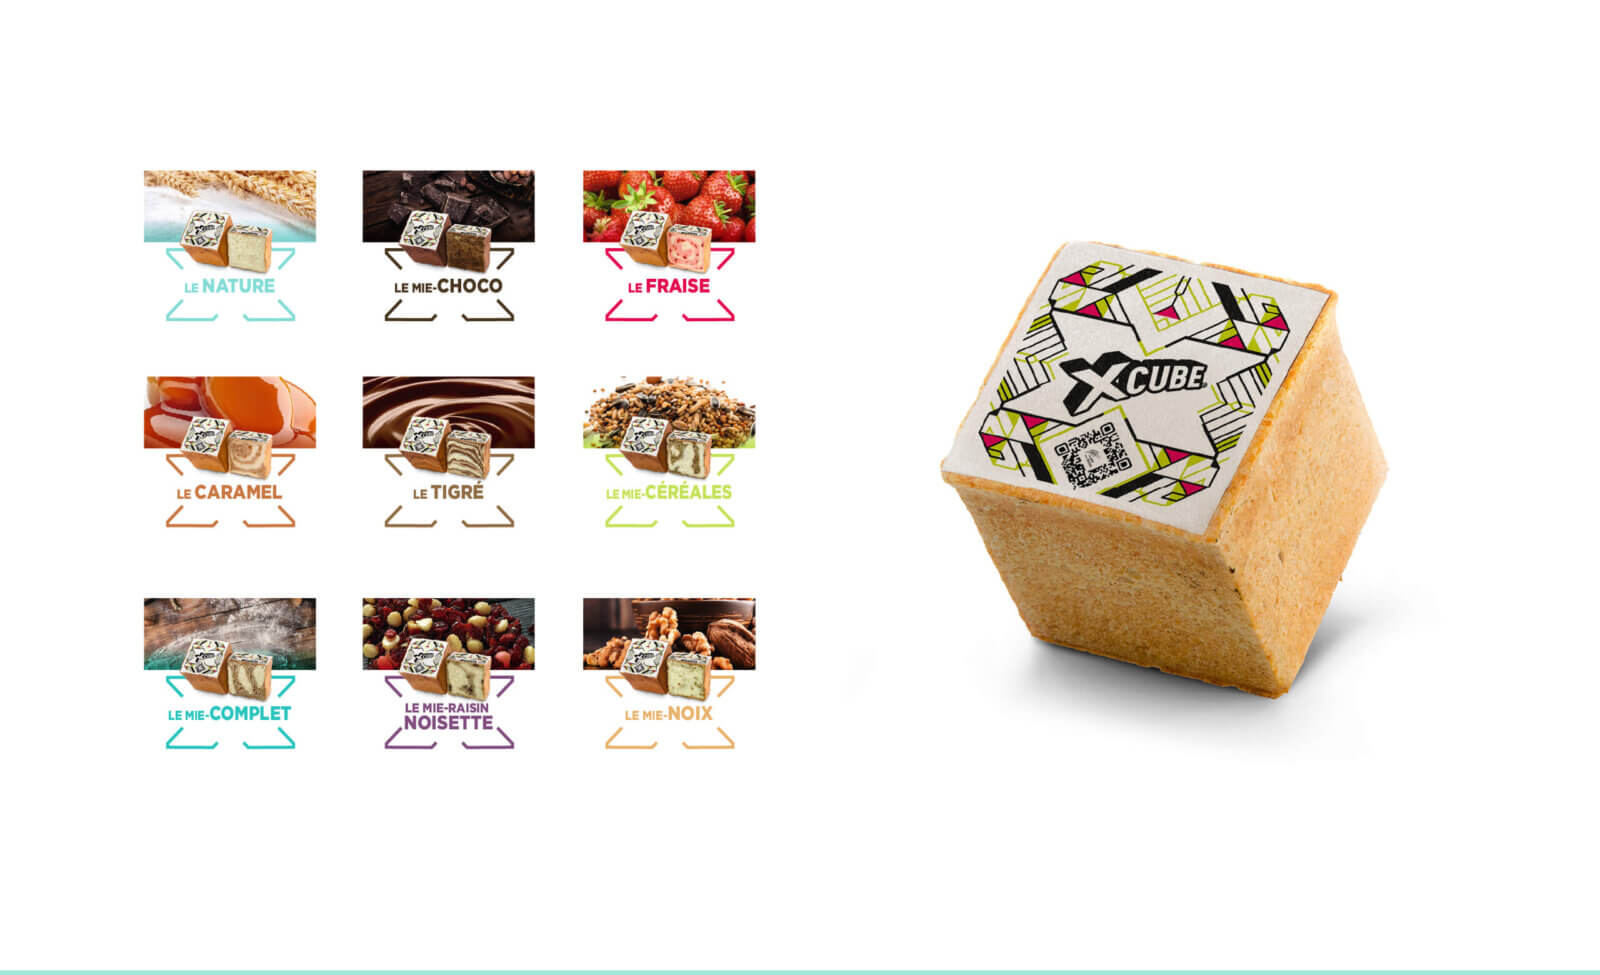 gamme produit X Cube